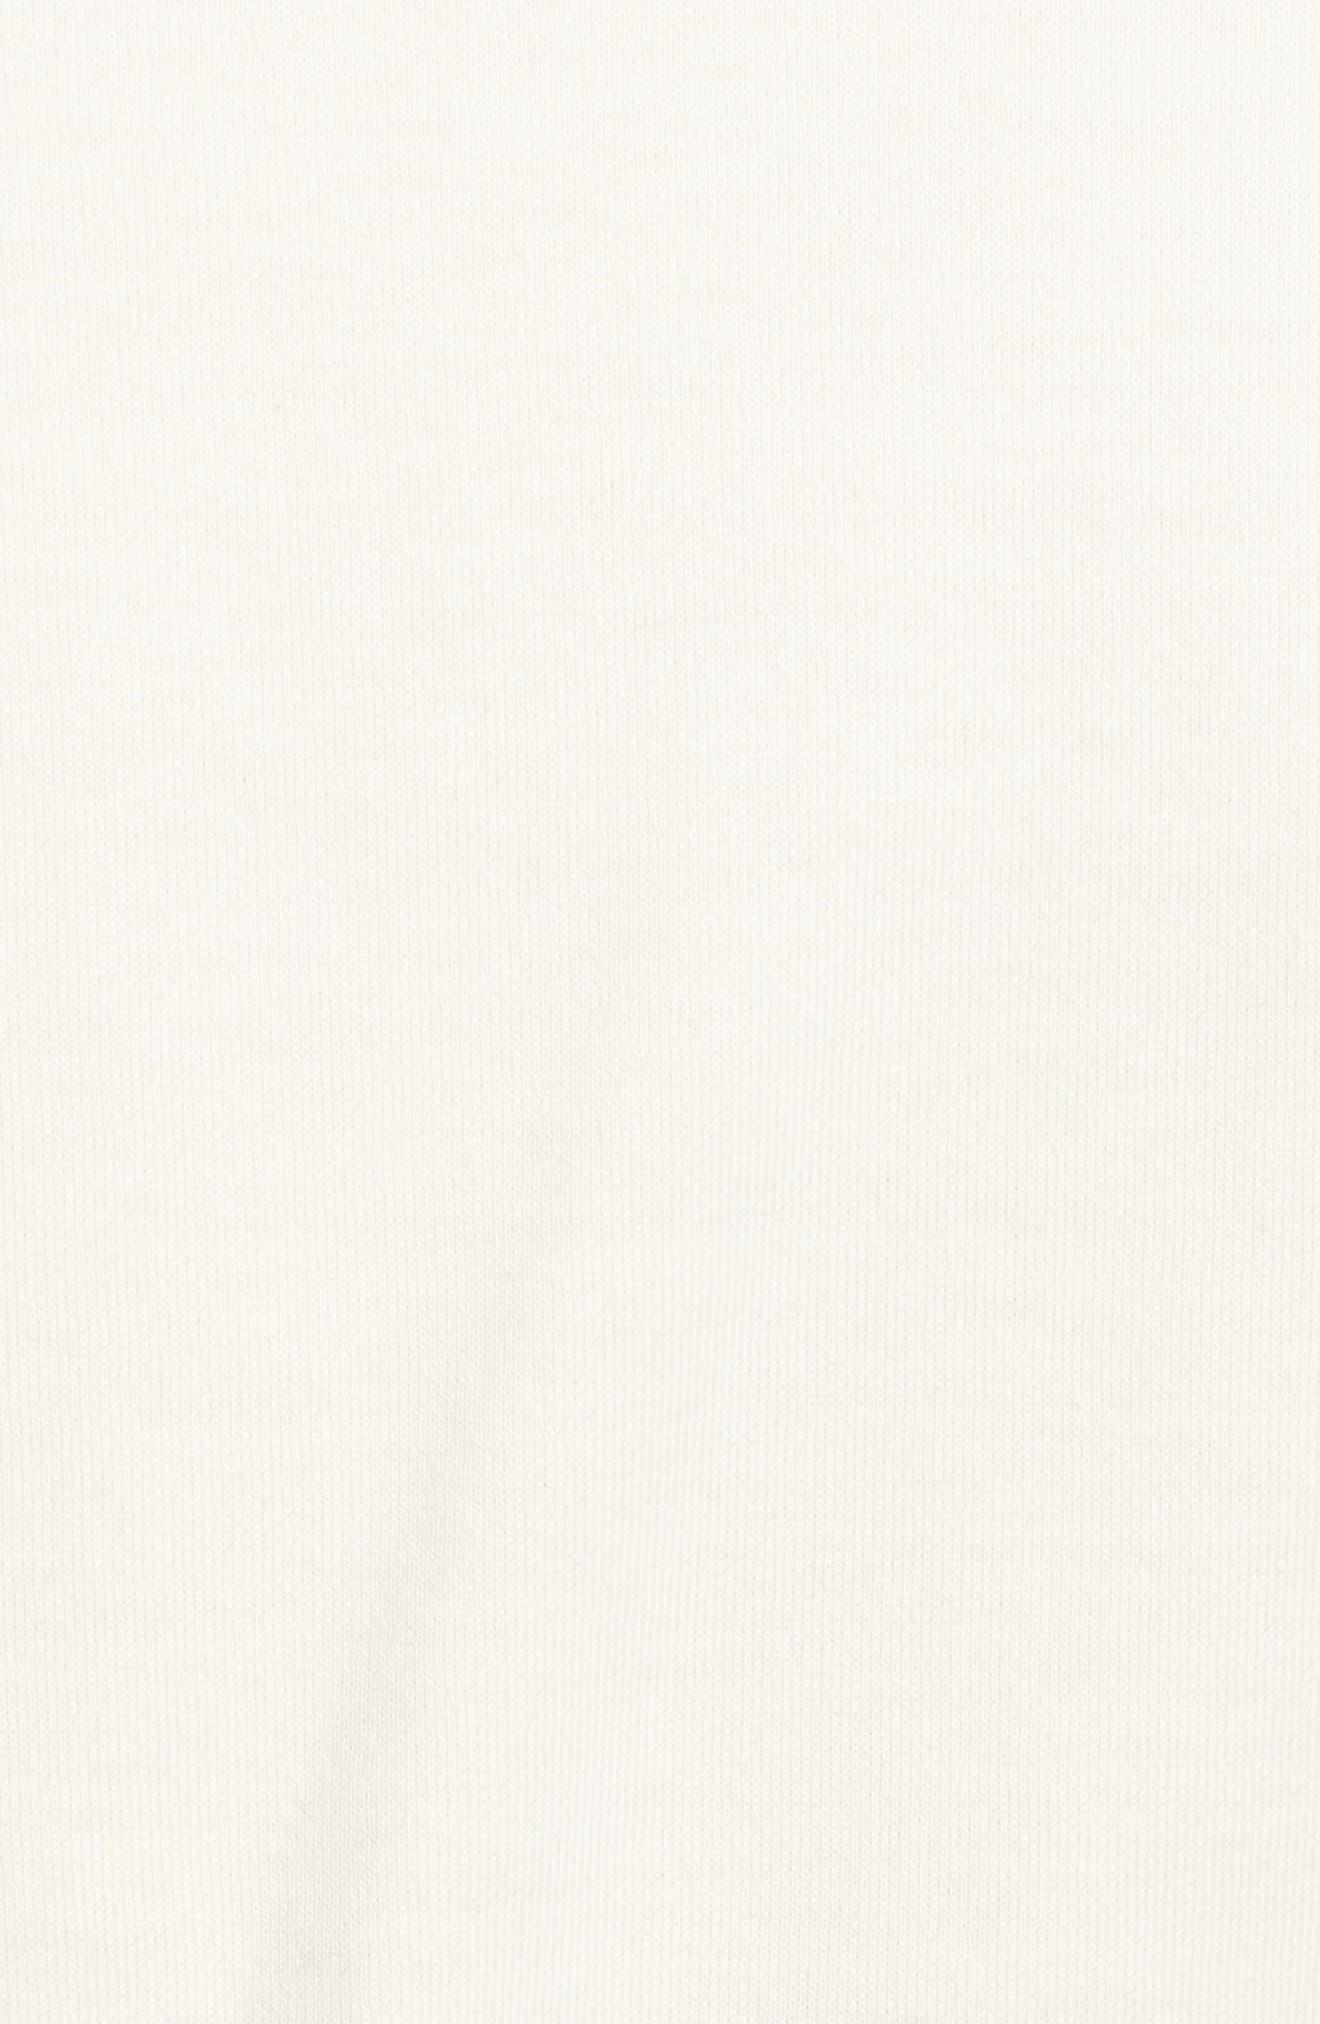 PUMA by Rihanna Graphic Crop Tank Top,                             Alternate thumbnail 5, color,                             100